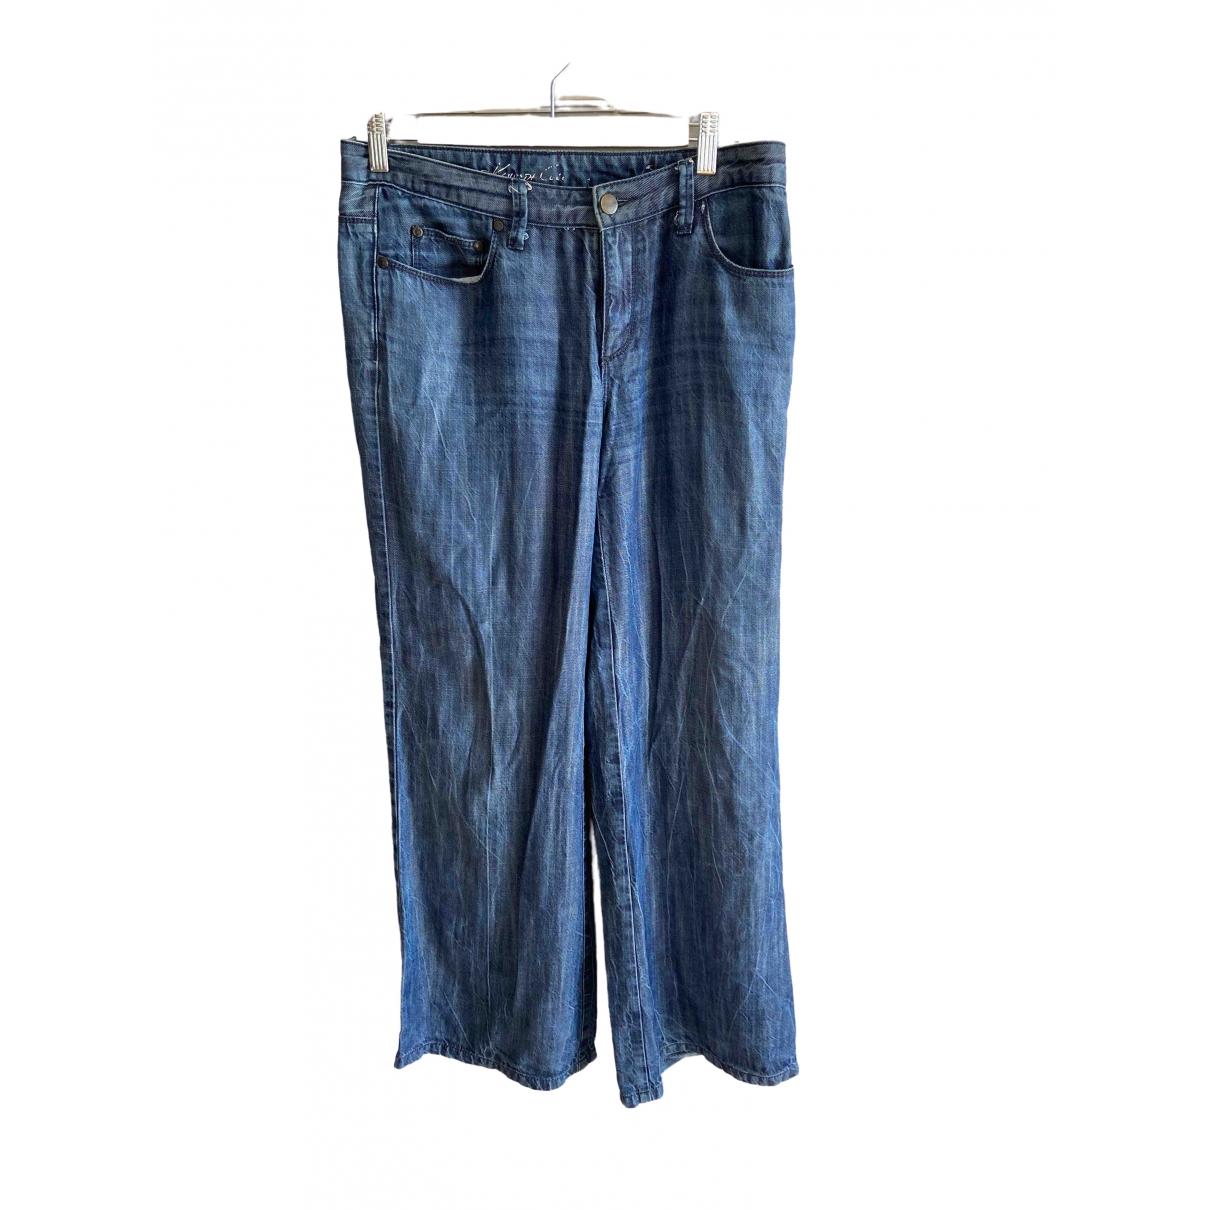 Kenneth Cole \N Blue Denim - Jeans Trousers for Women 38 FR